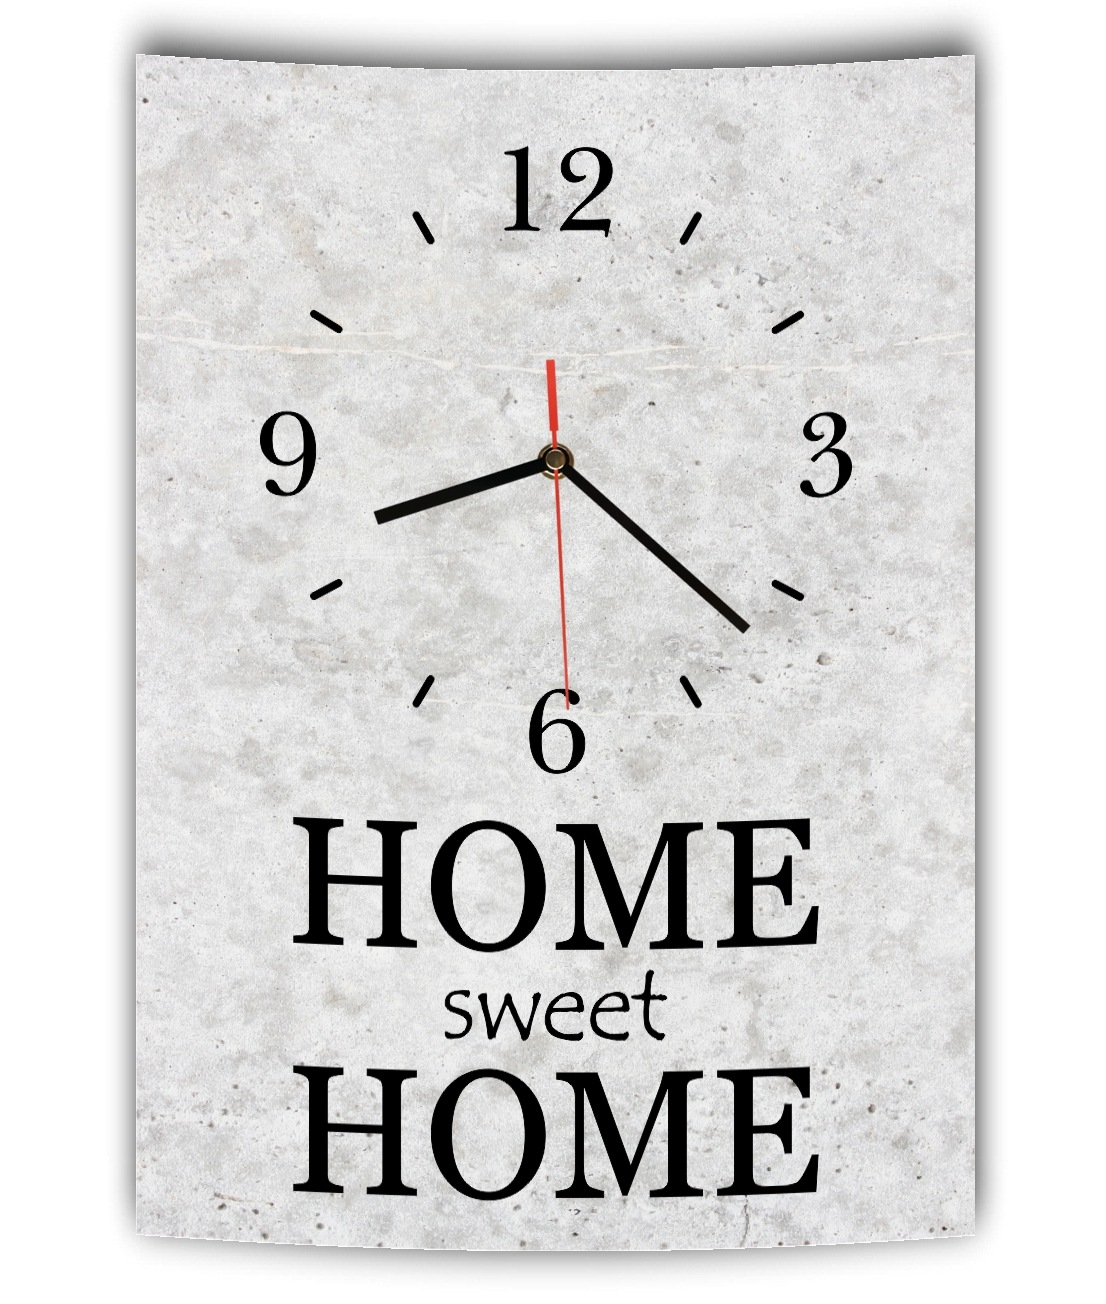 lautlose designer wanduhr mit spruch home sweet home grau betonoptik